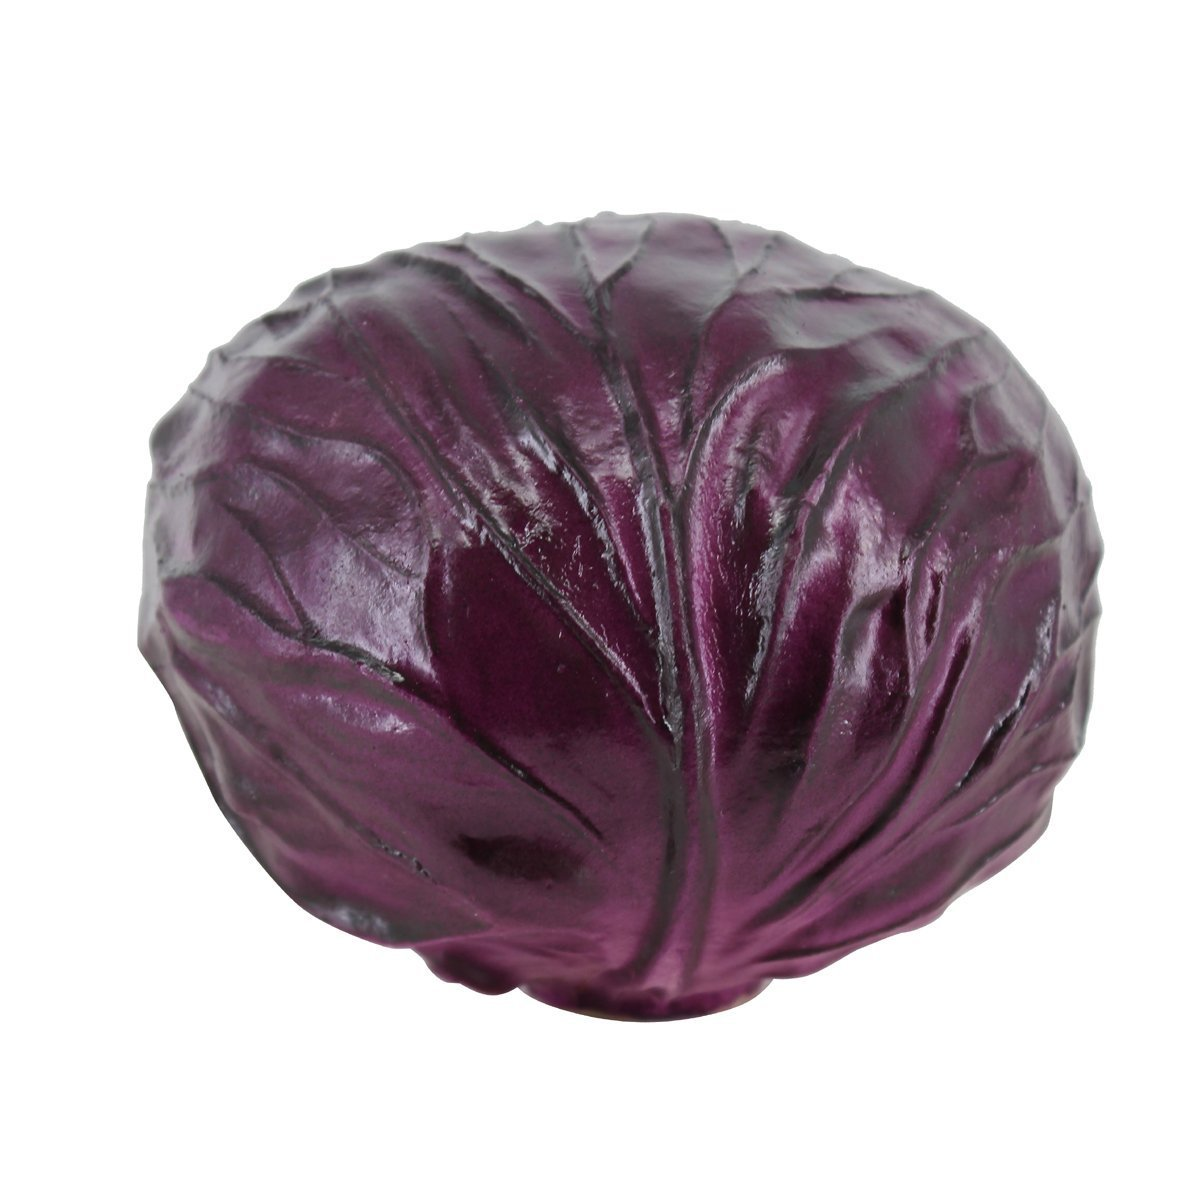 Lorigun PU Fake Red Cabbage Simulation Bubble Fruits & Vegetables Emotion Arrangement Scenes Props Simulation X 1Pcs Cabbage